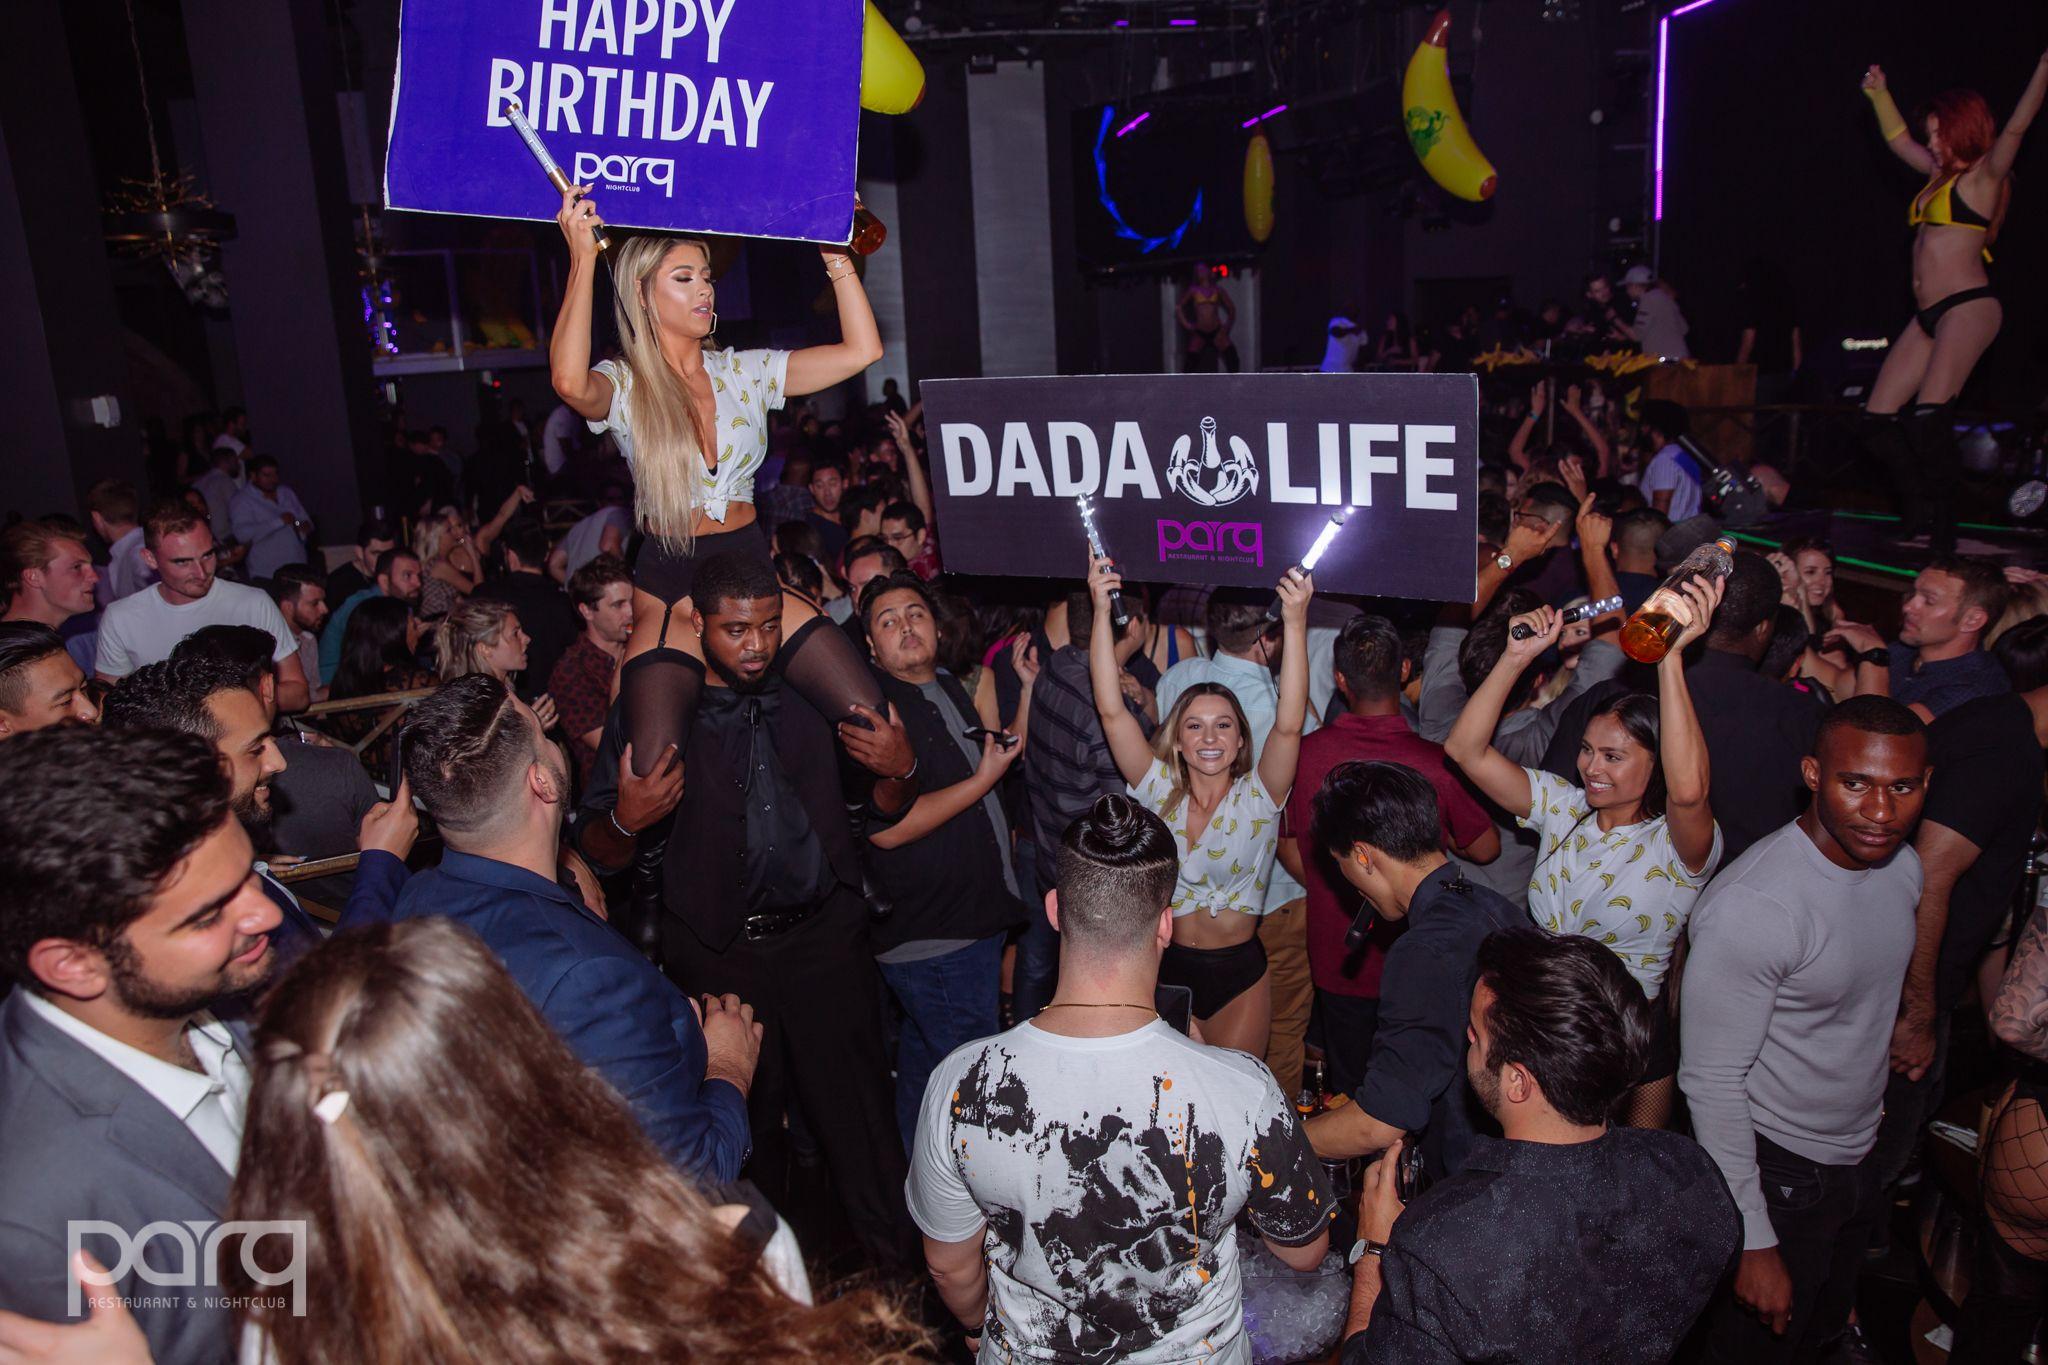 06.09.18 Parq - Dada Life-8.jpg